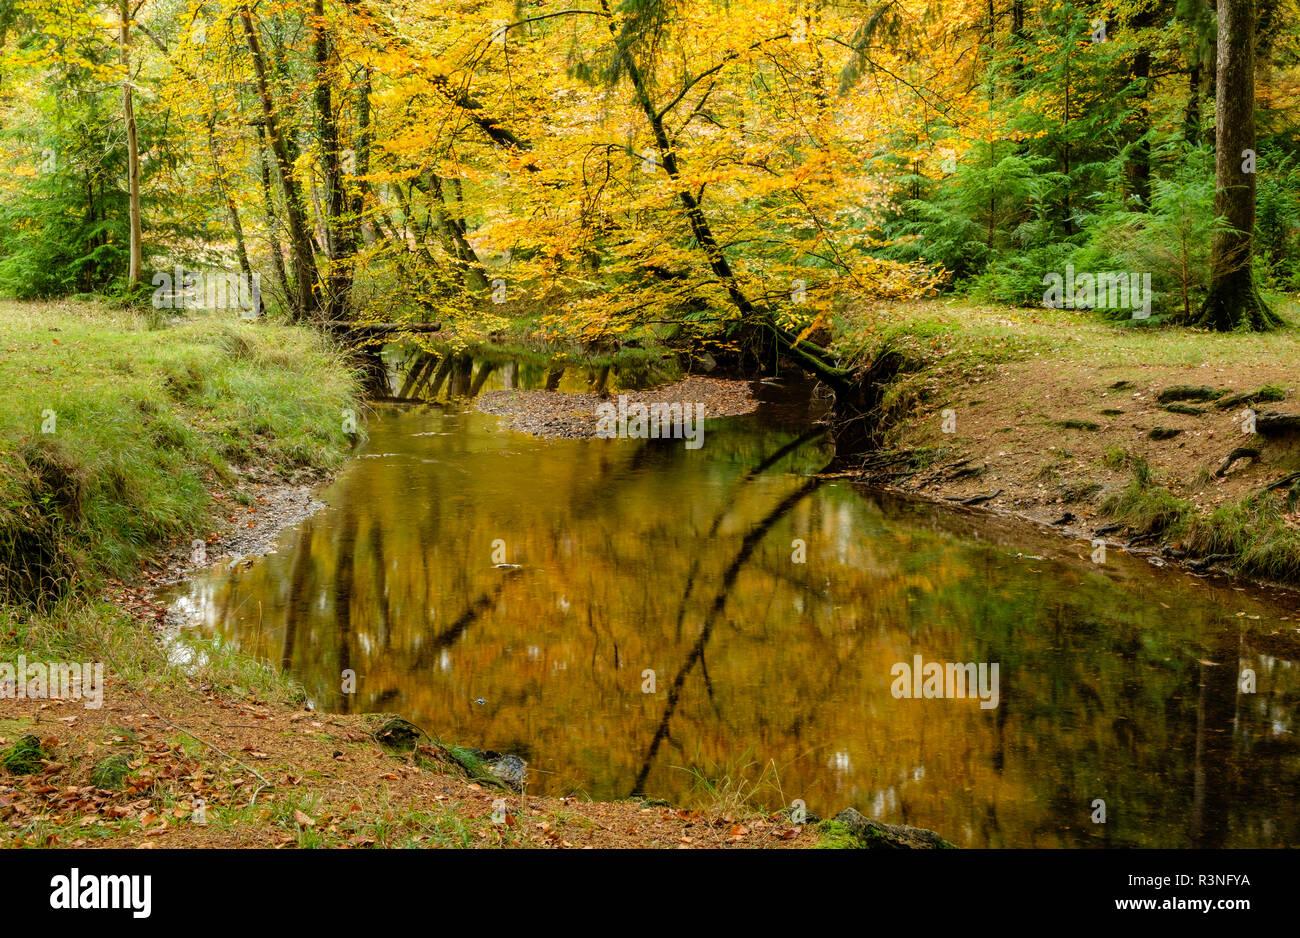 Blackwater River, New Forest National Park, Hampshire, England, UK, - Stock Image